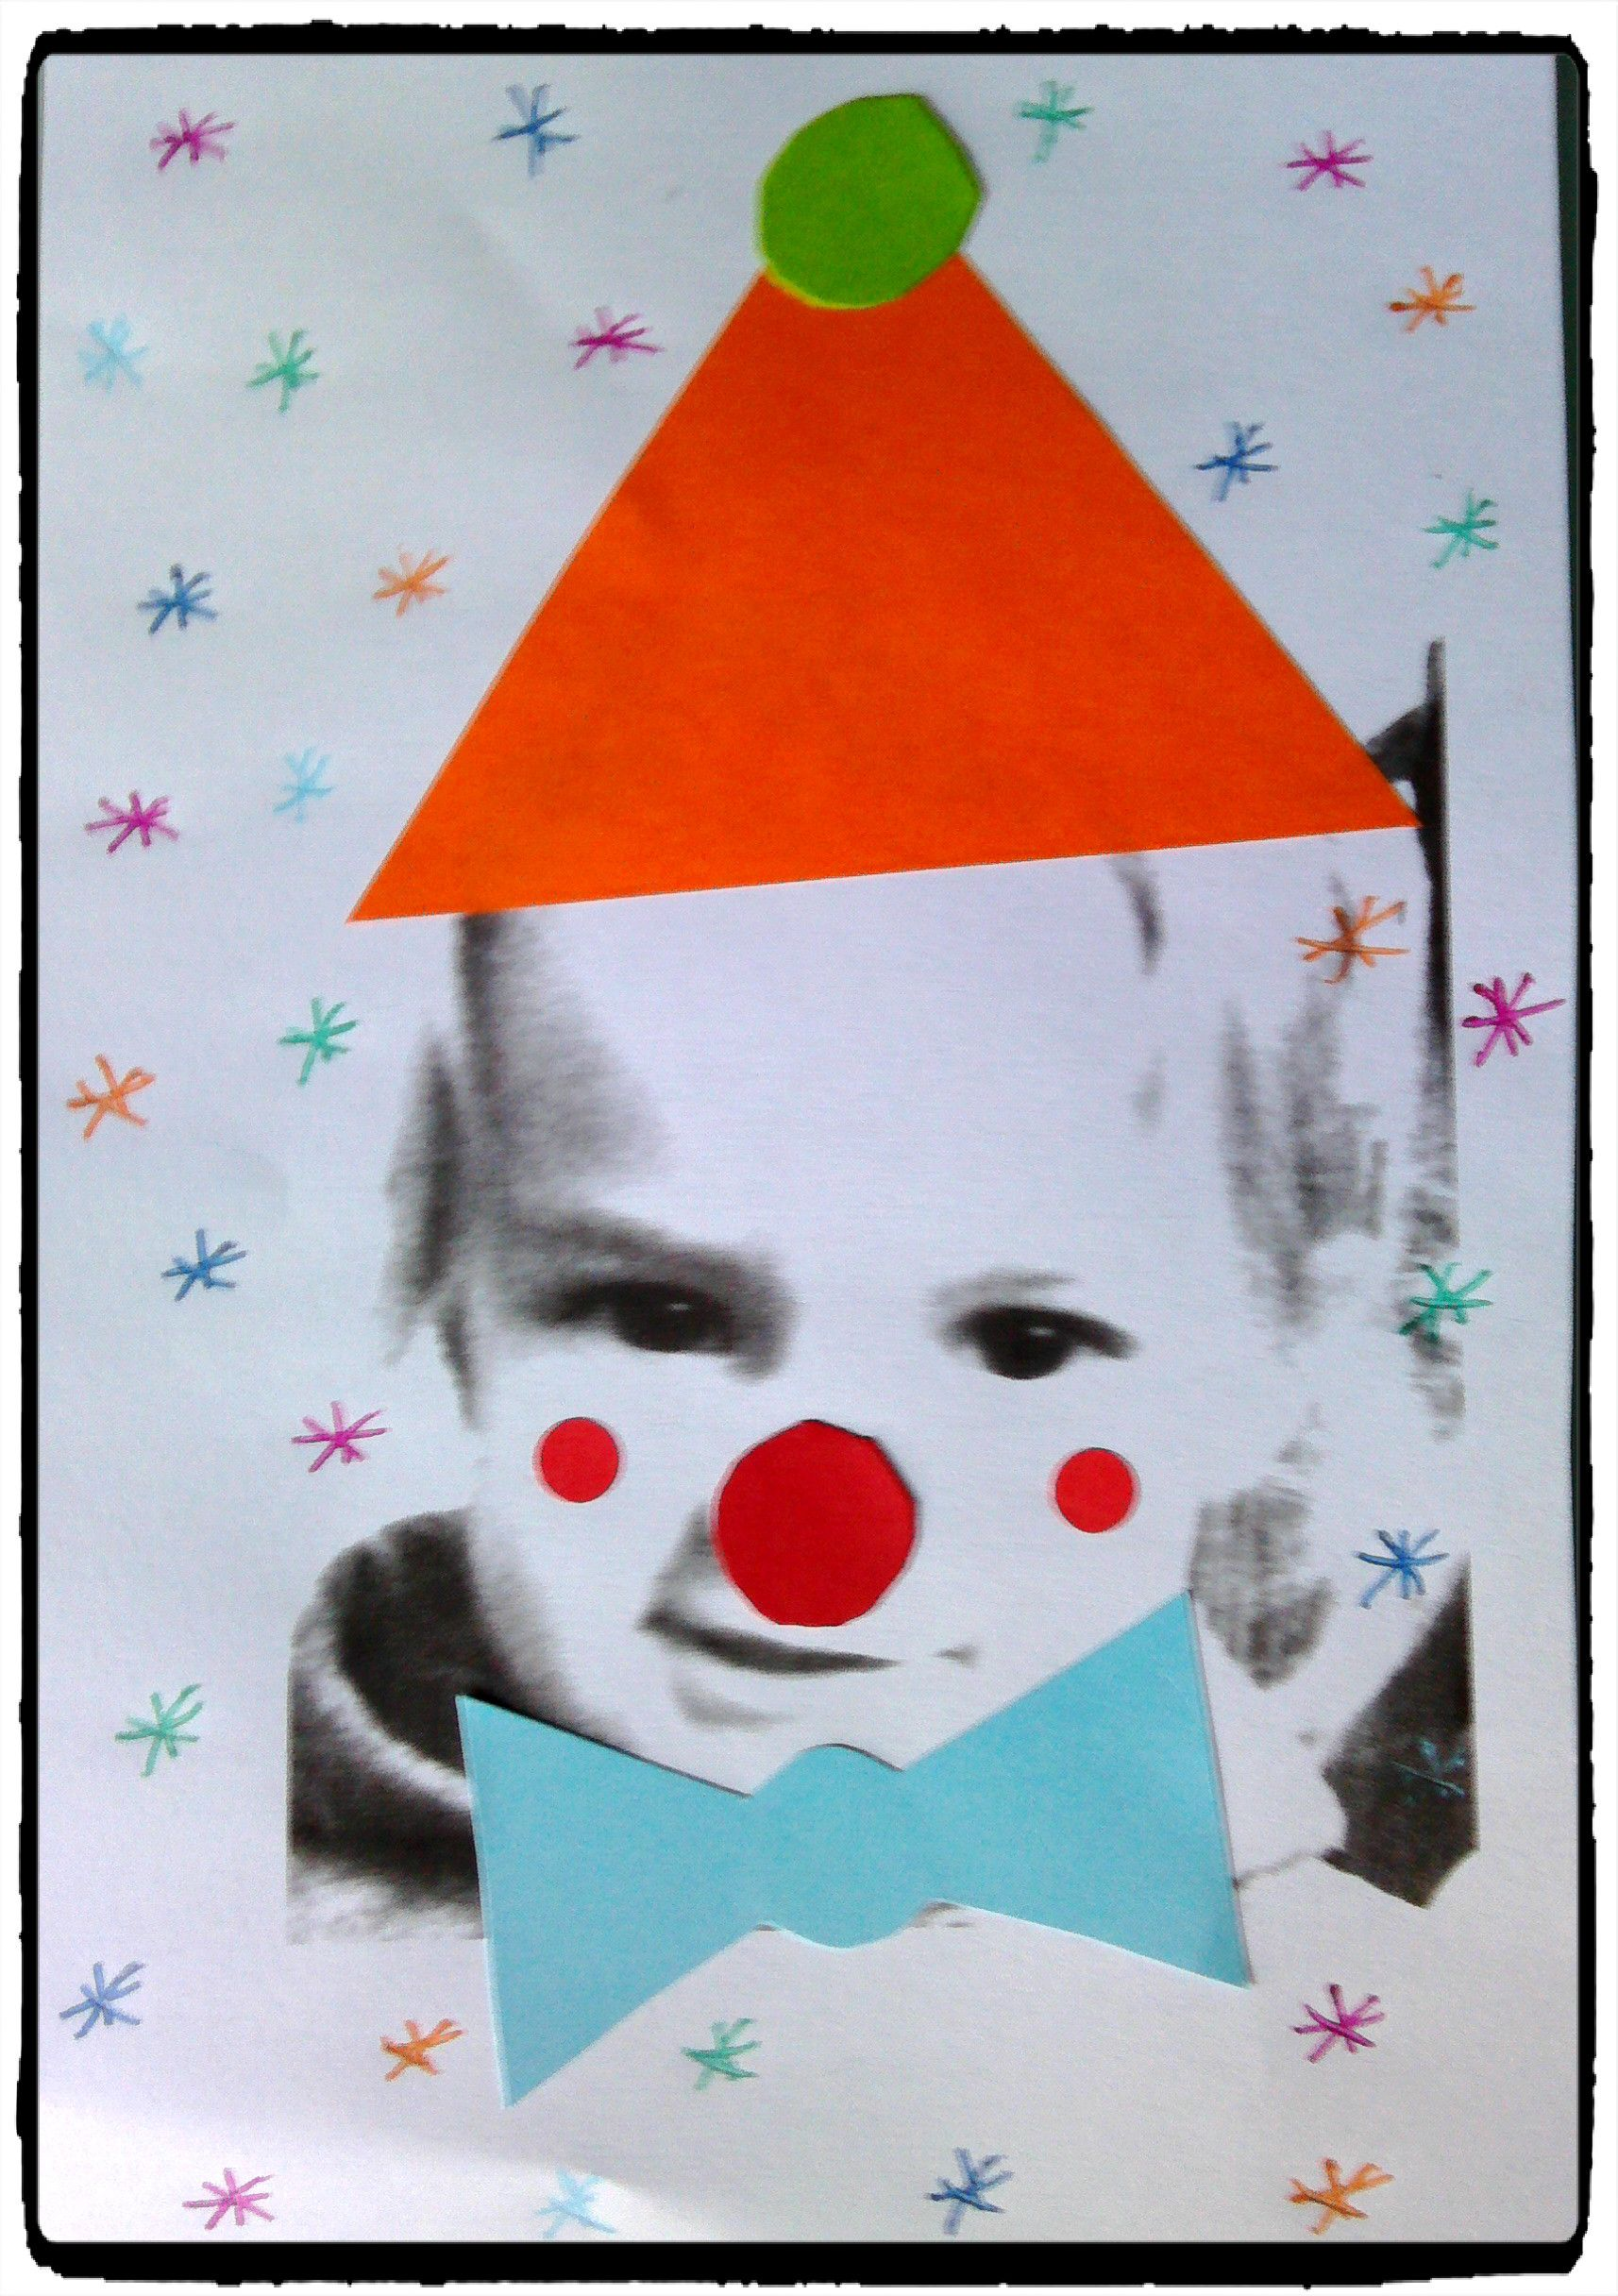 d guiser l 39 enfant en clown collage bricolage cirque et carnaval mardi gras cirque et. Black Bedroom Furniture Sets. Home Design Ideas